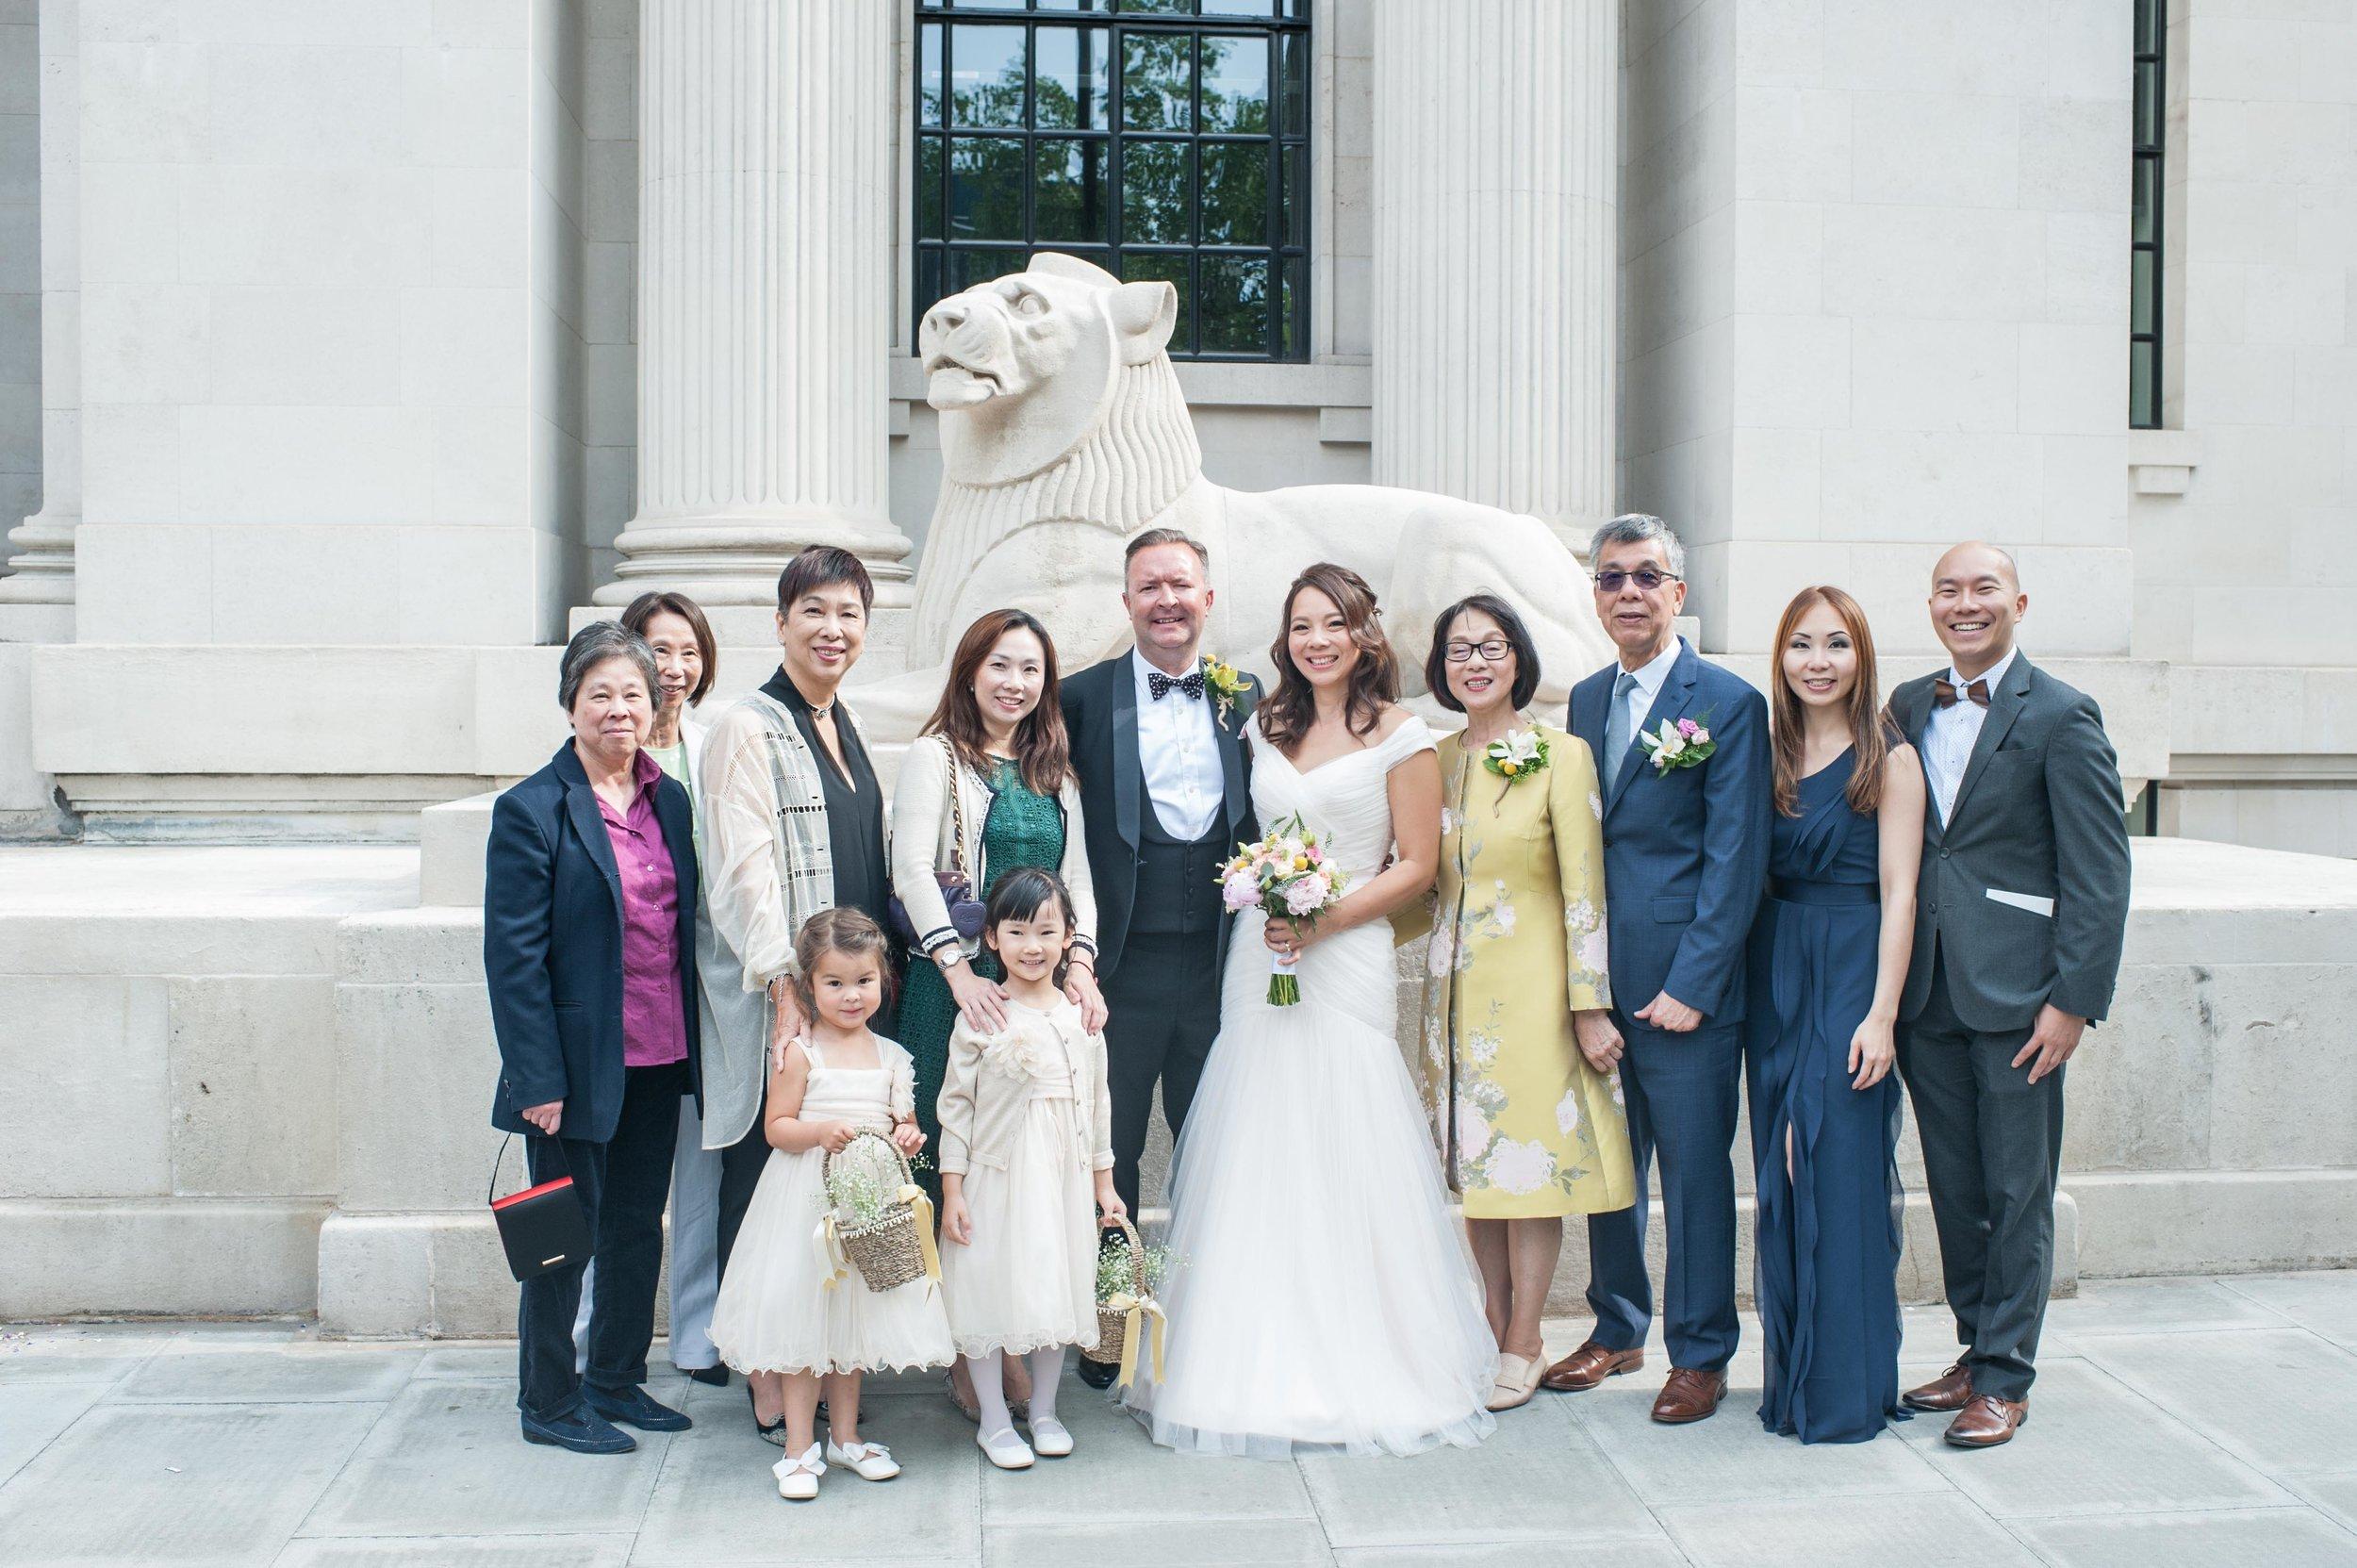 D&M_Marylebone Town Hall Wedding (138 of 239).jpg